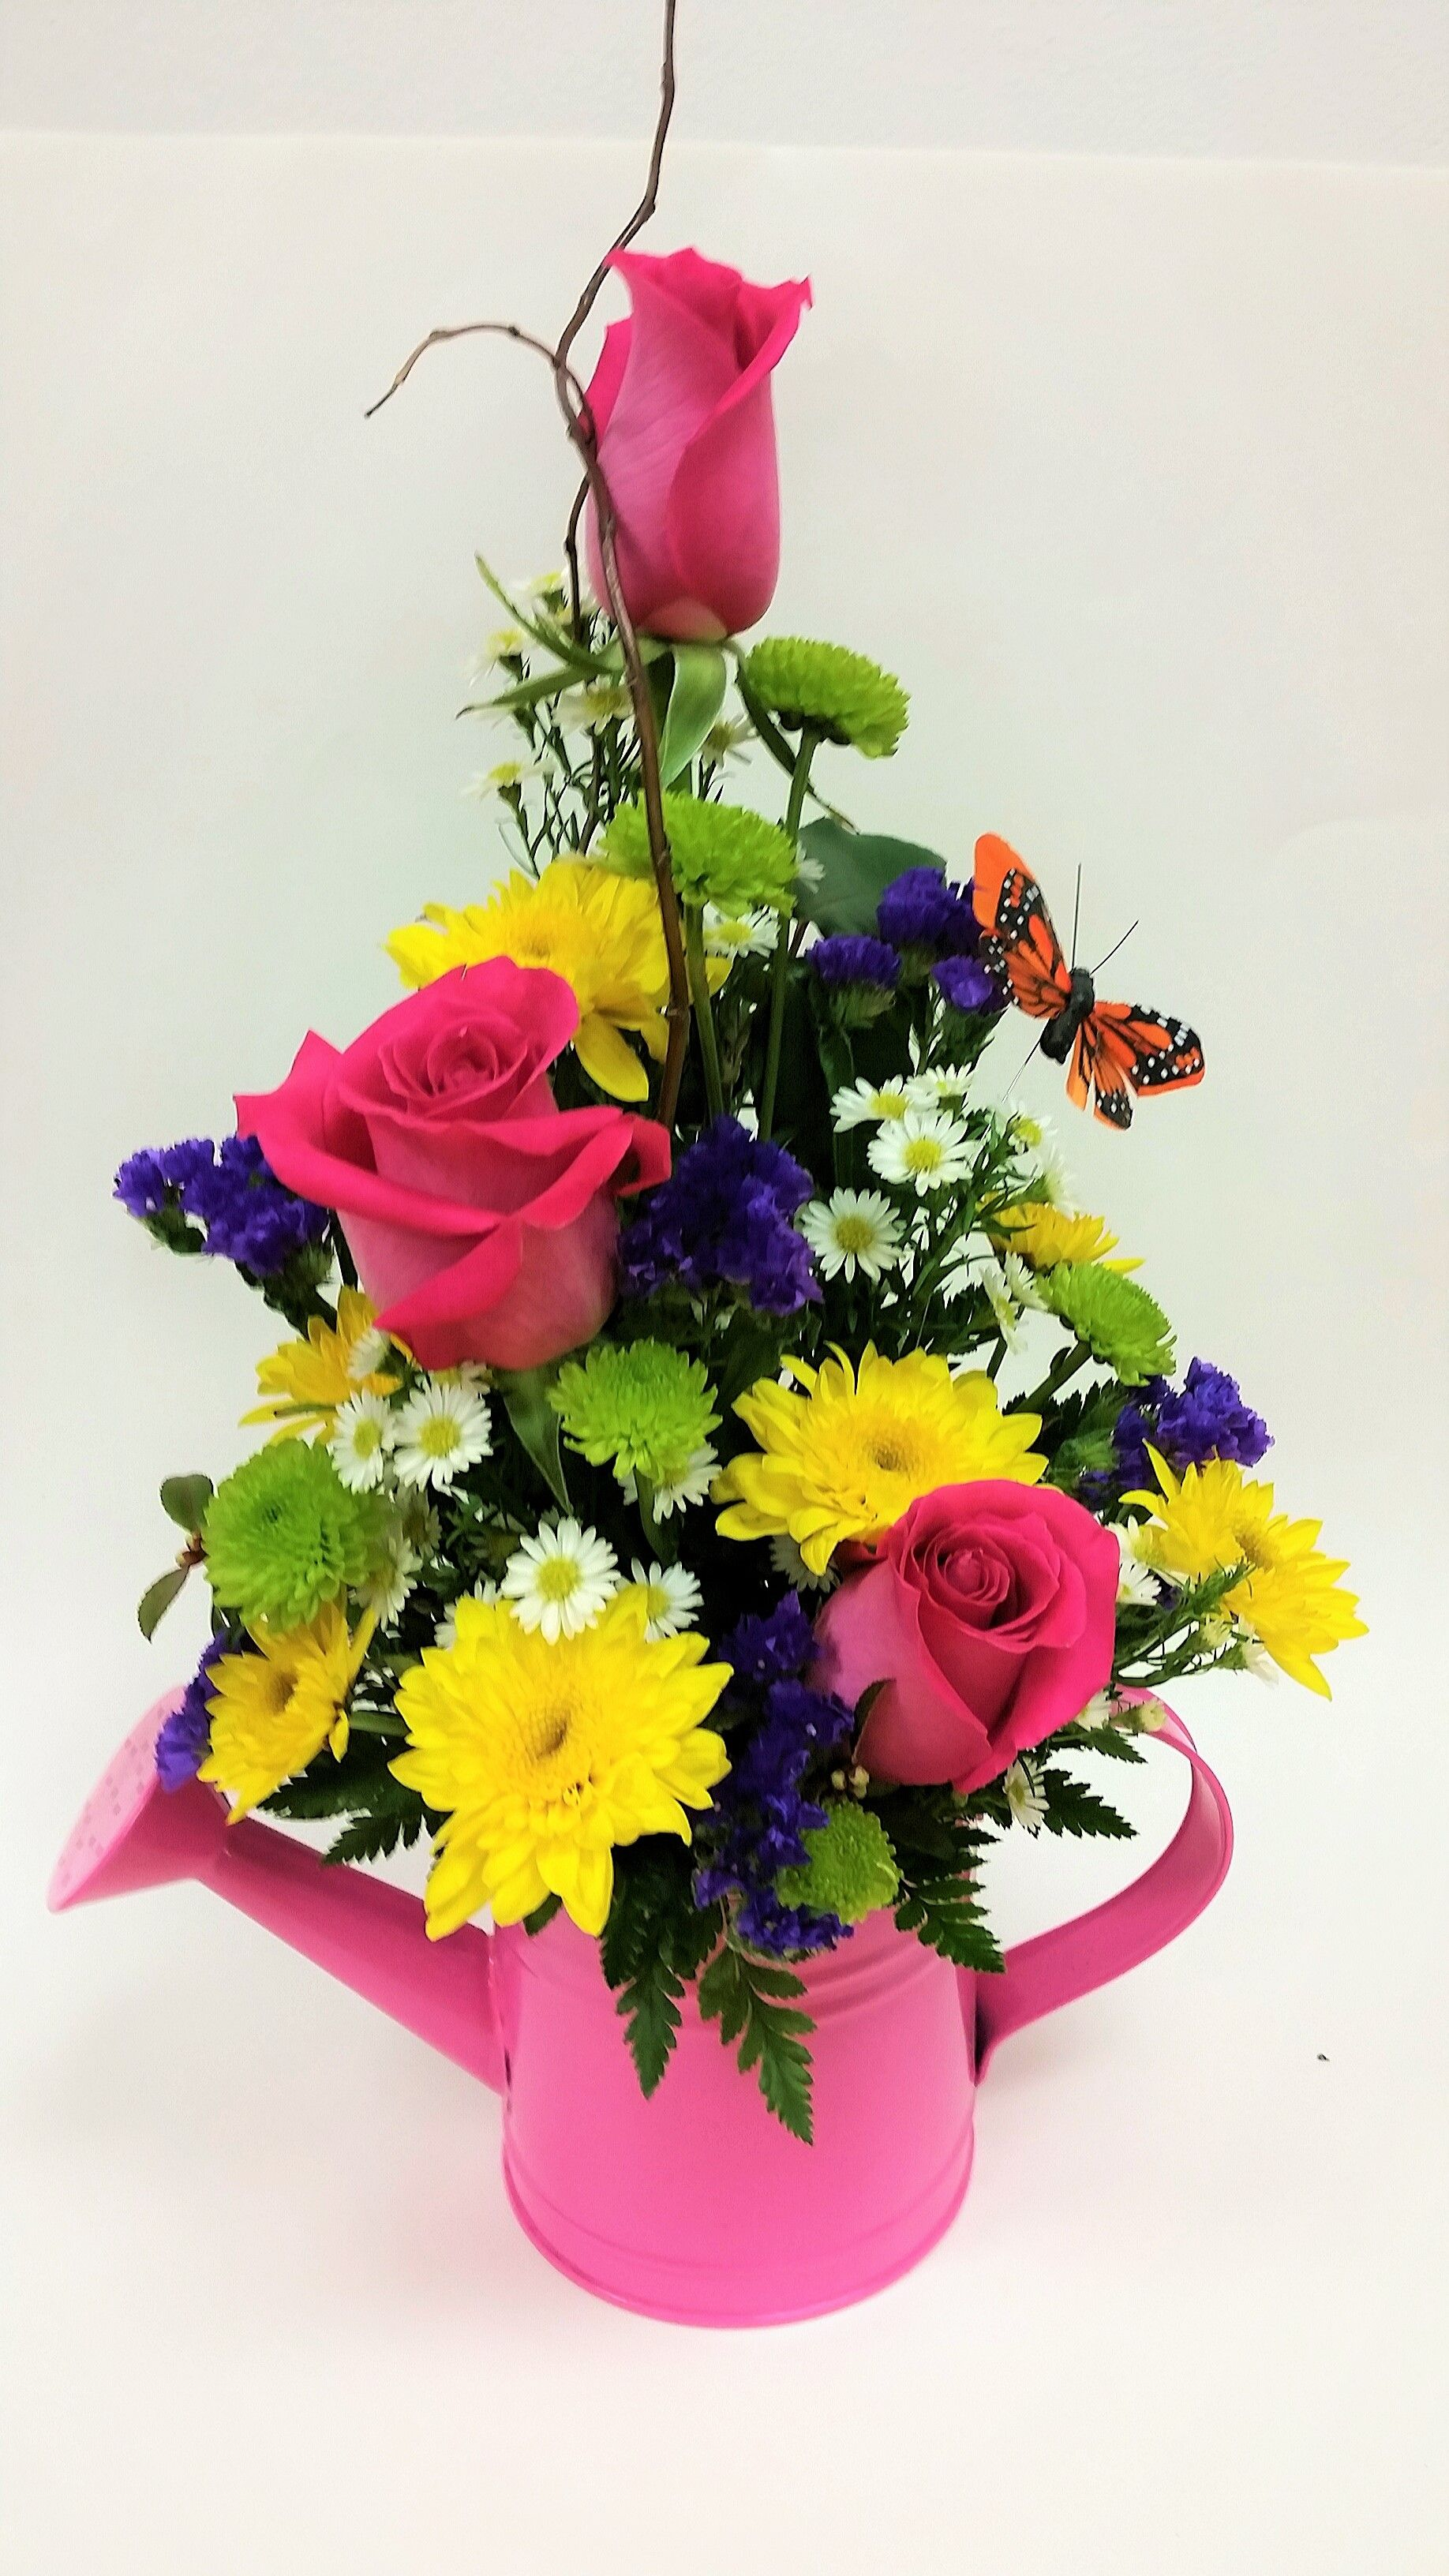 Watering Can Bouquet Norman Florist Flower Shop In Flanders Livingston